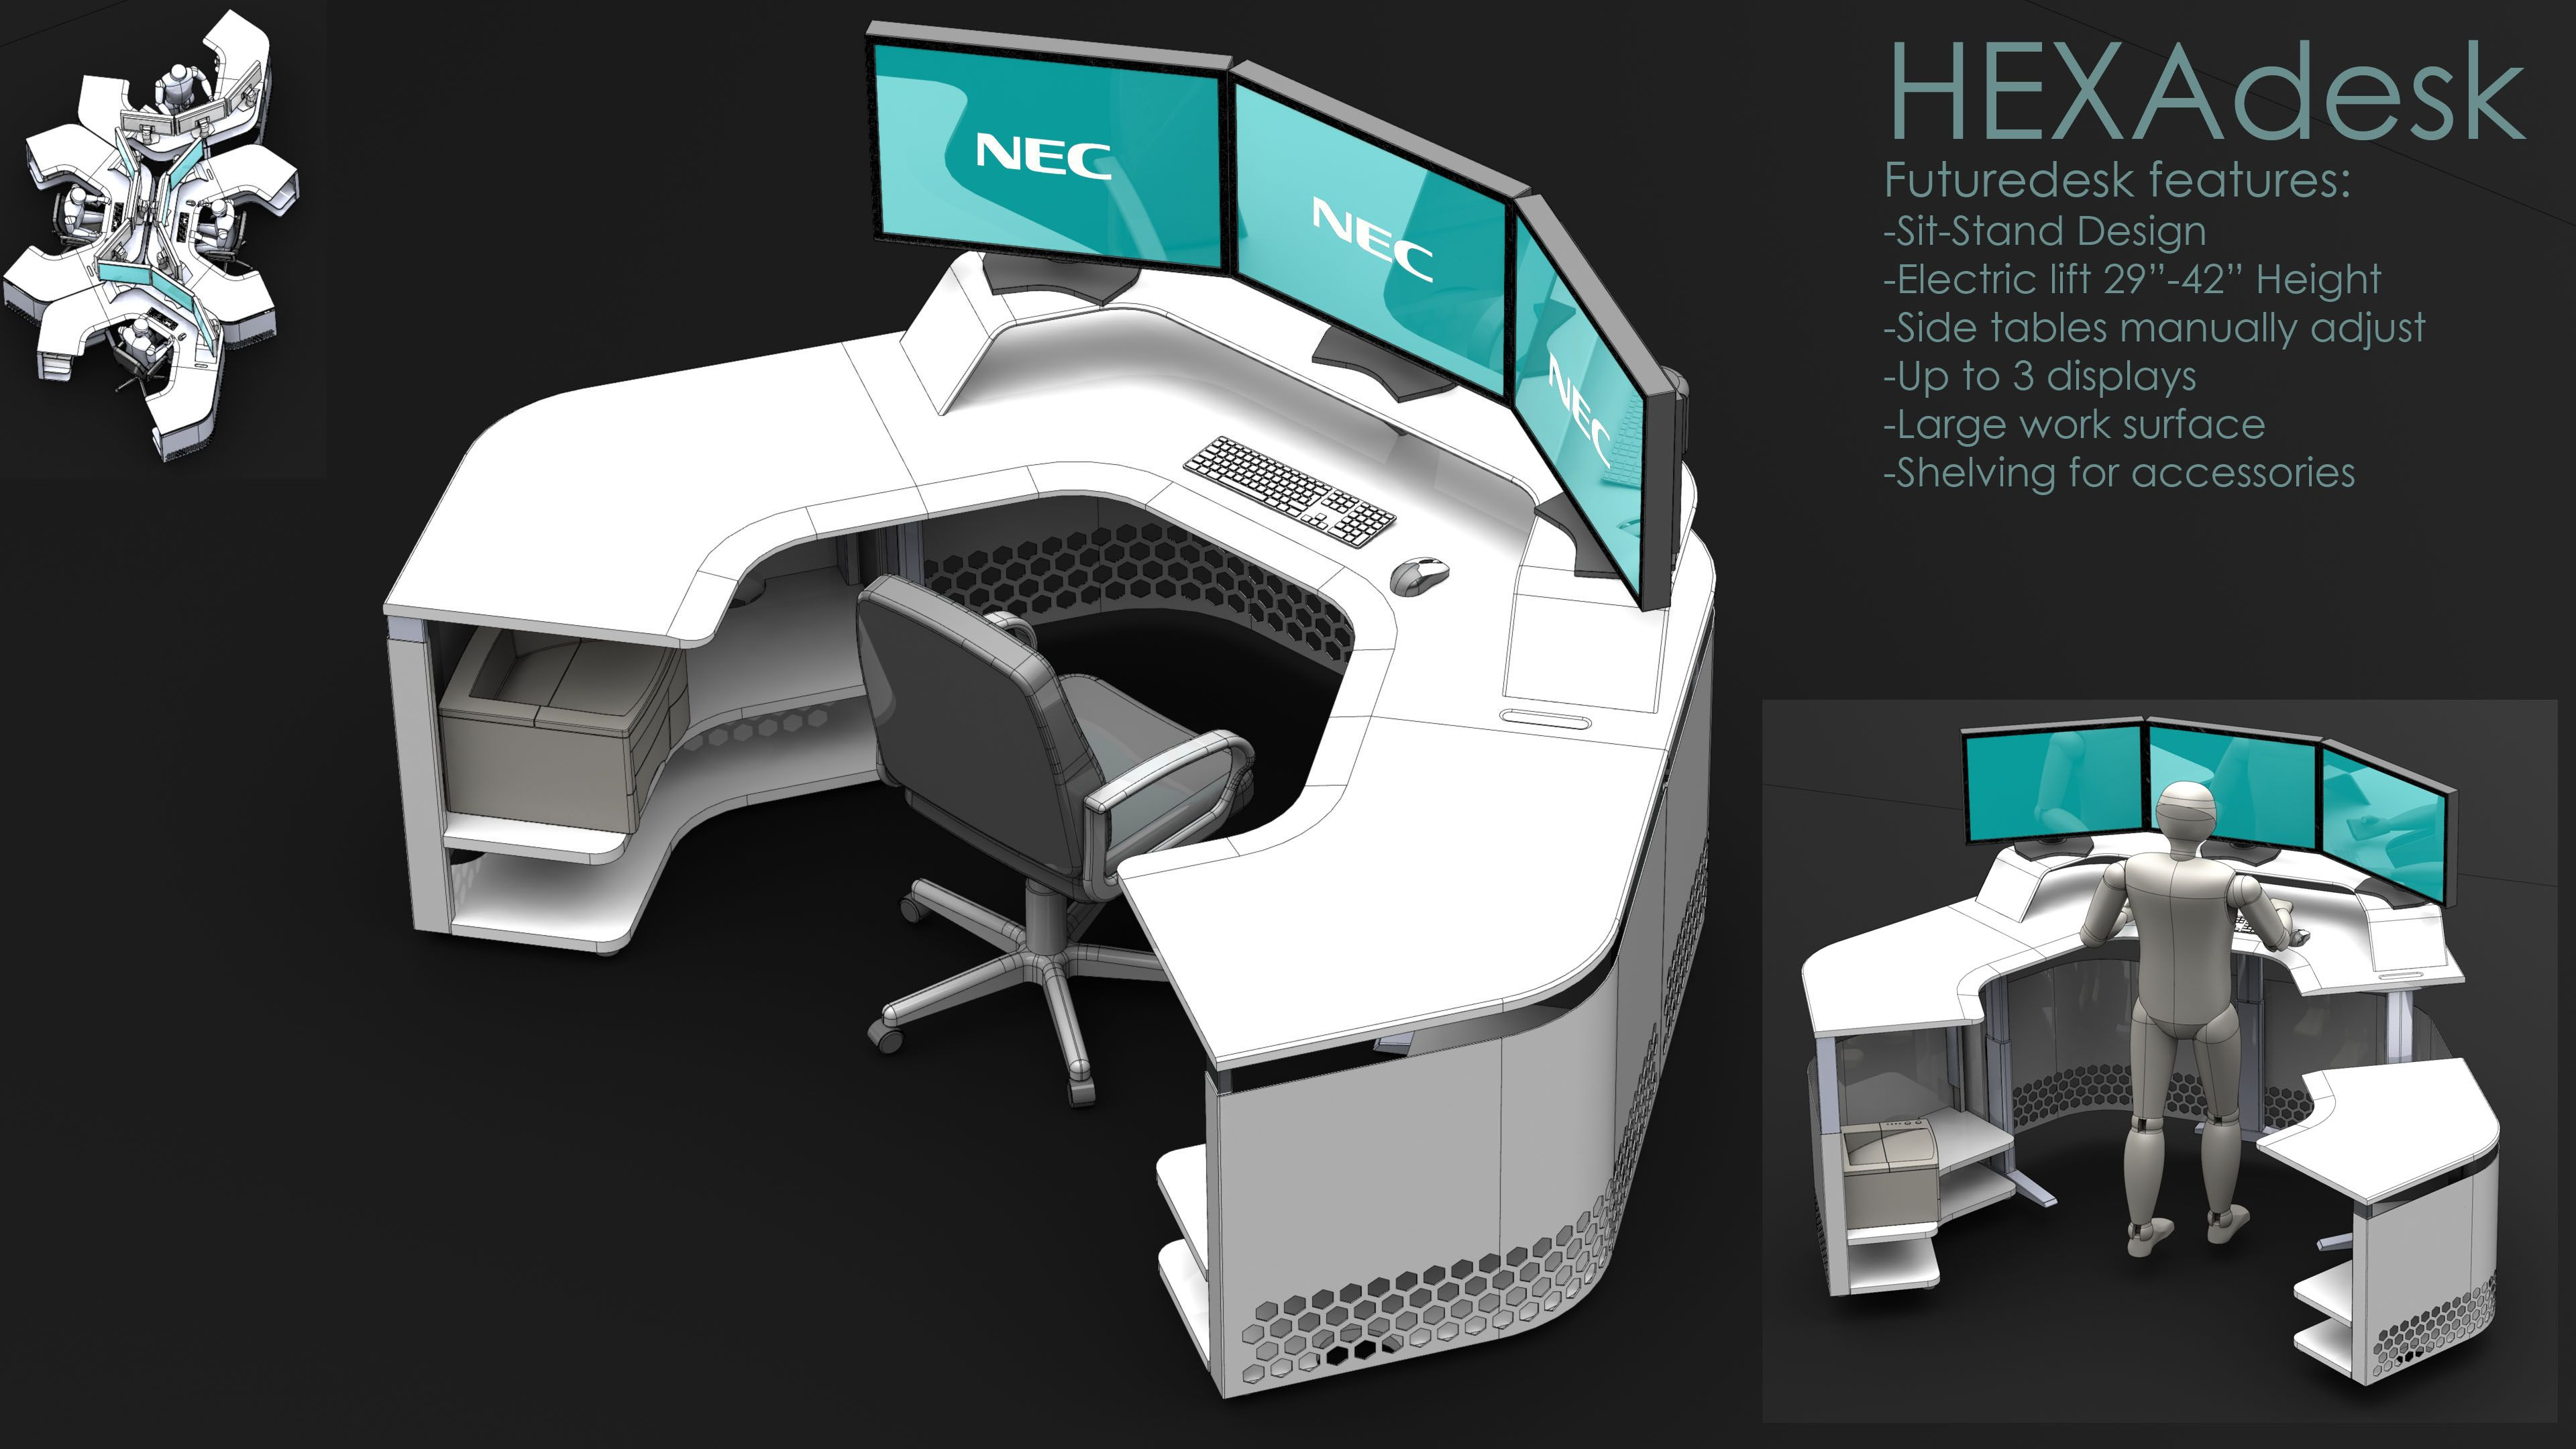 Futuredesk- HEXAdesk - SOLIDWORKS,STEP / IGES - 3D CAD model